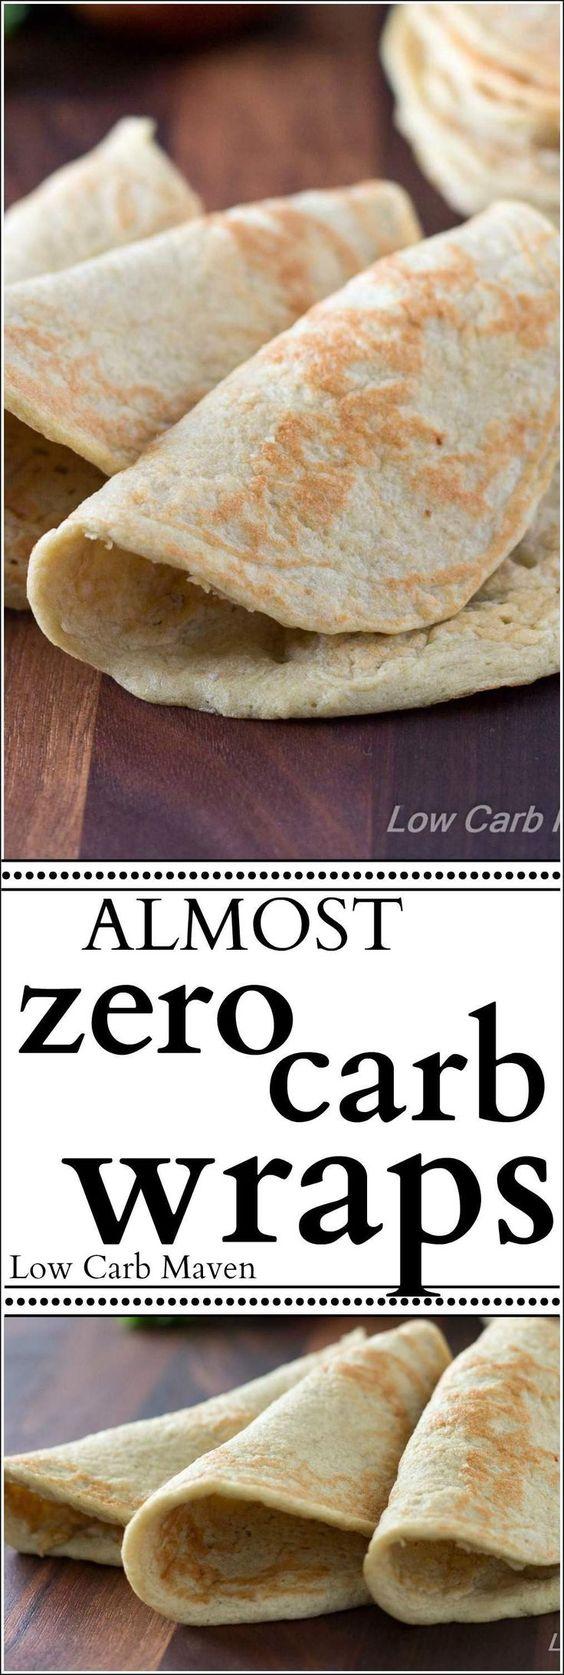 Almost Zero Carb Wraps Almost Zero Carb Wraps